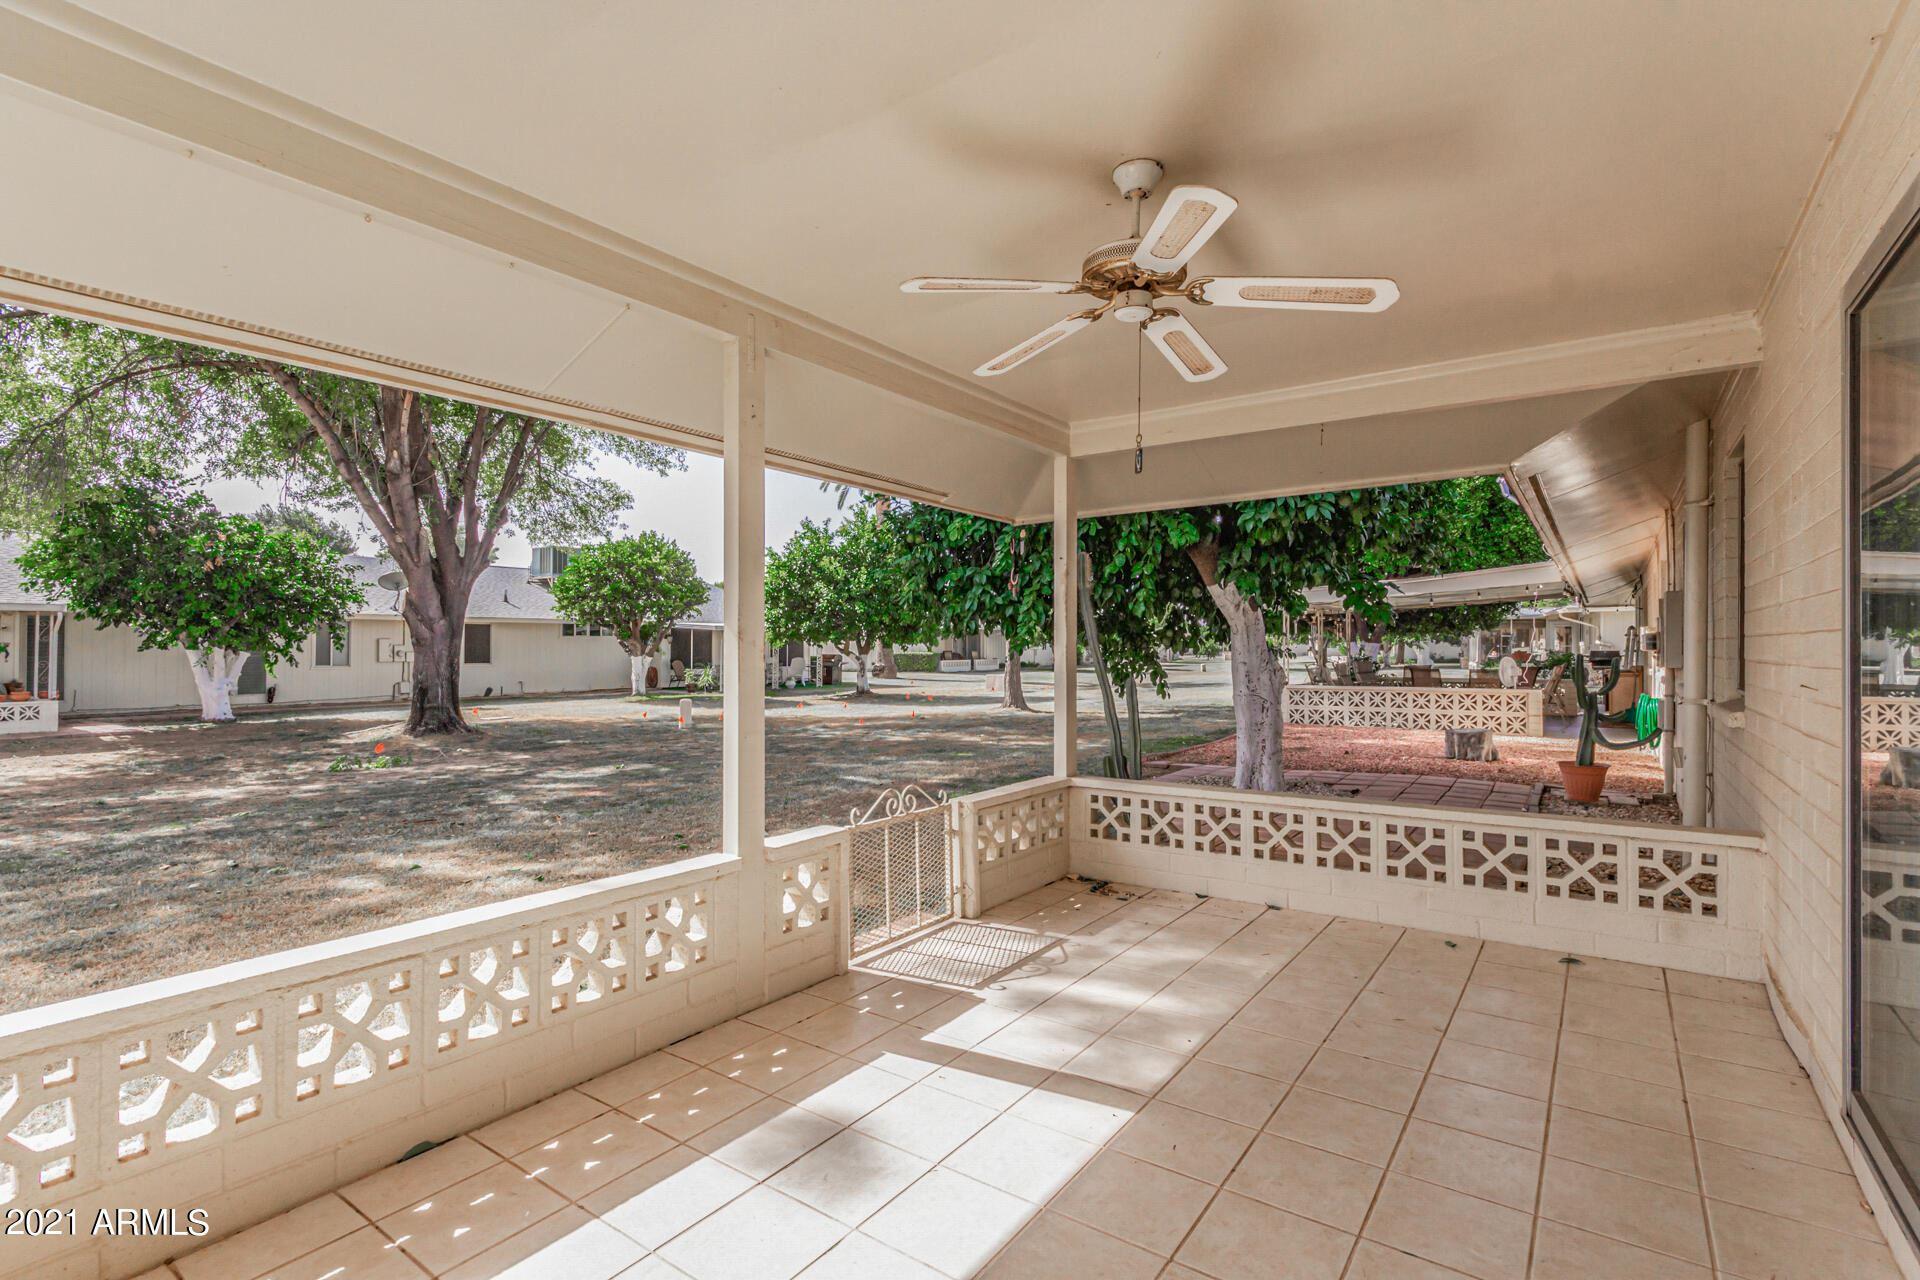 Photo of 10401 W DESERT FOREST Circle, Sun City, AZ 85351 (MLS # 6306948)